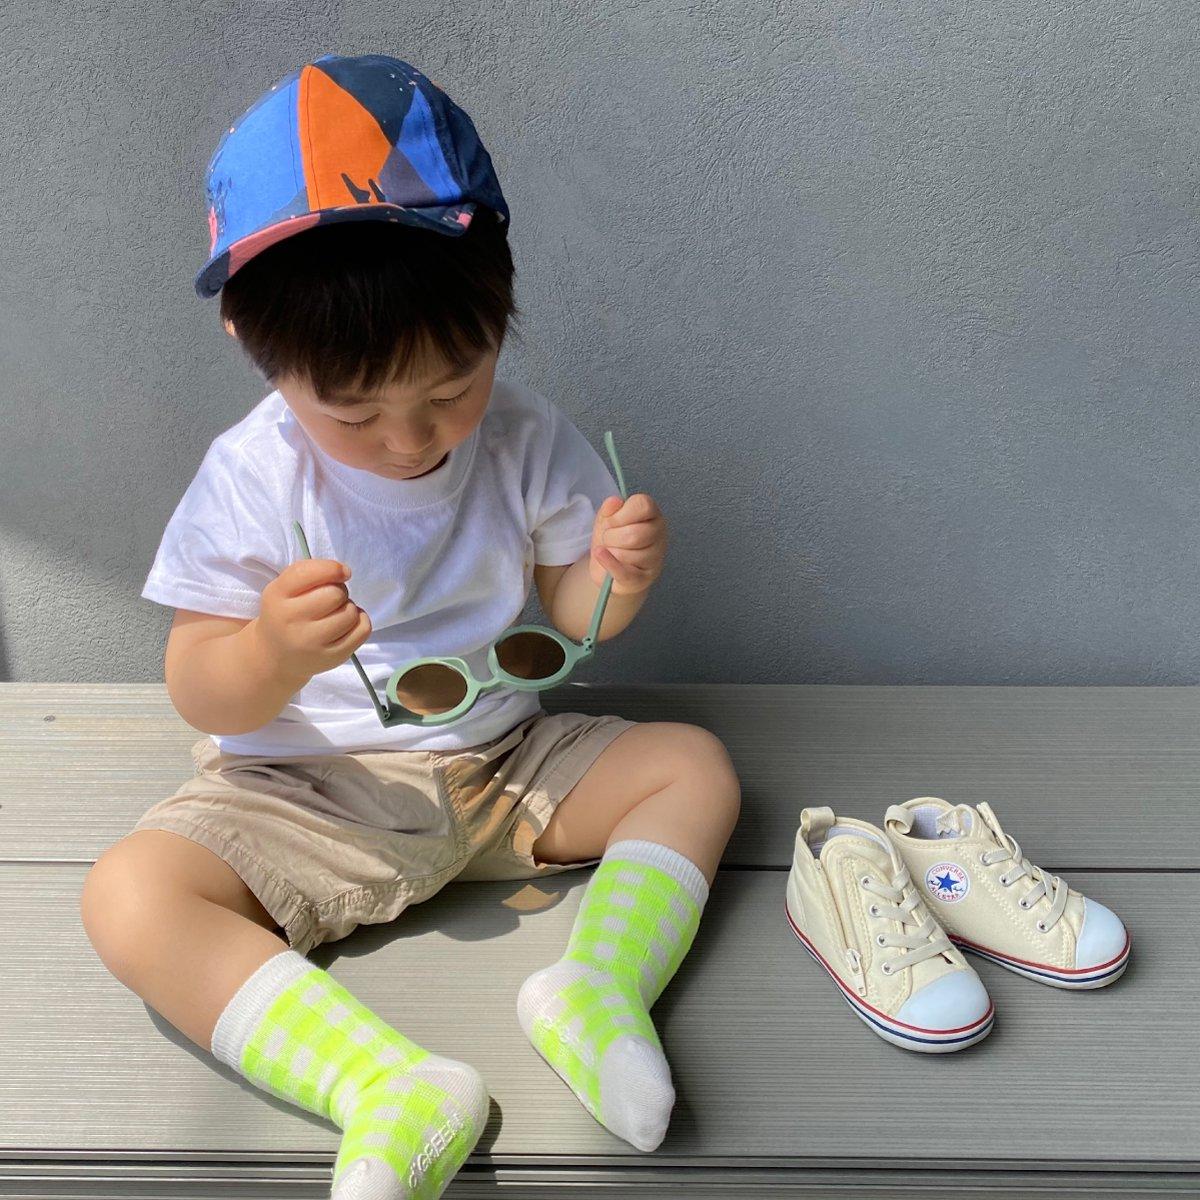 【KIDS】Kids Colorful Sunglasses 詳細画像14